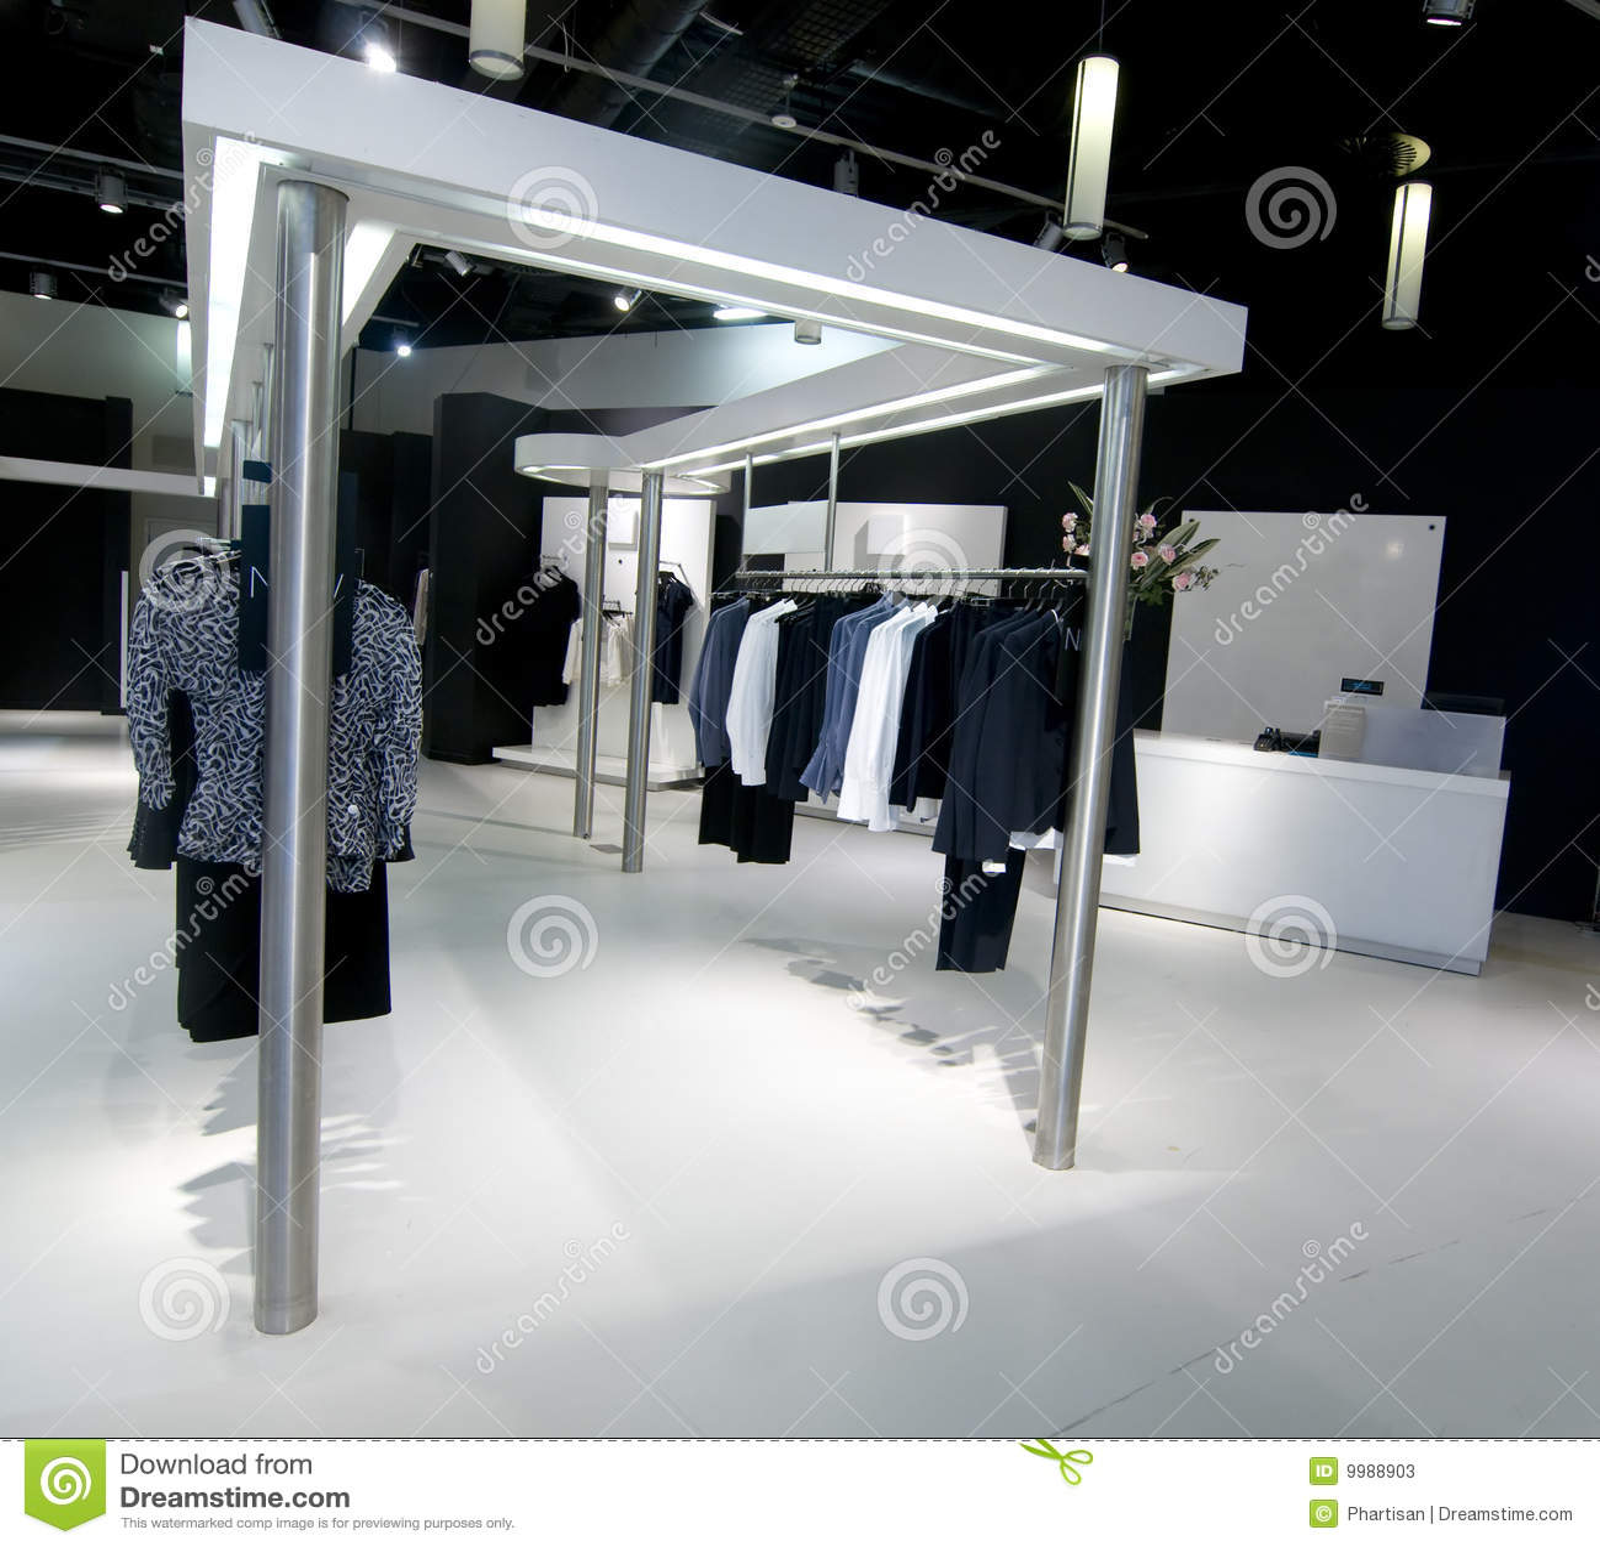 Woman upscale fashion retail store